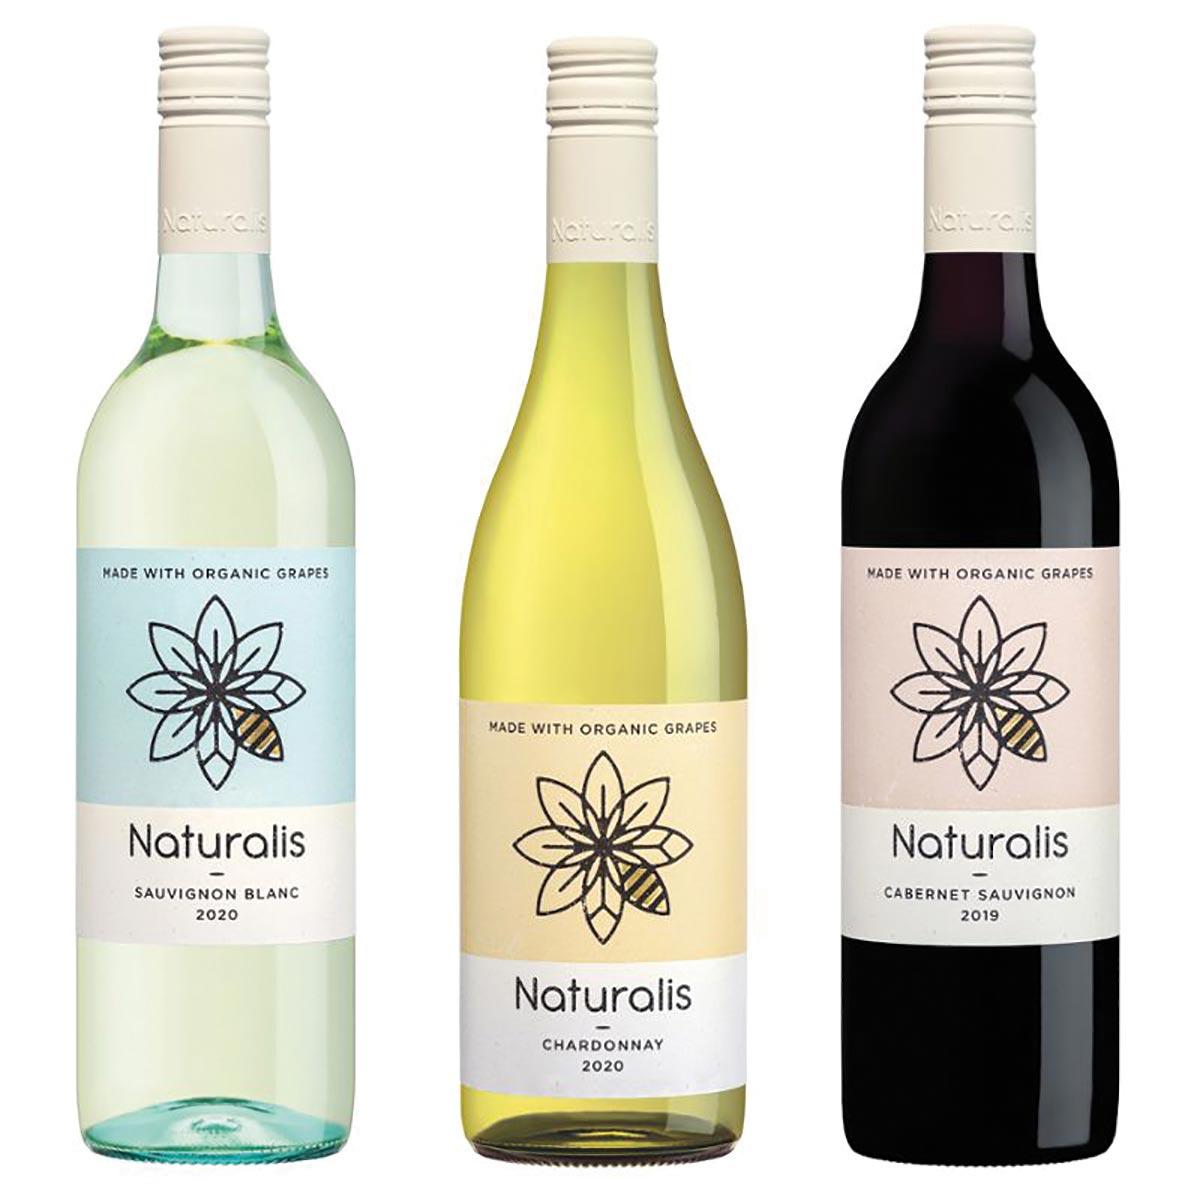 California's Naturalis Wines Launch Locally